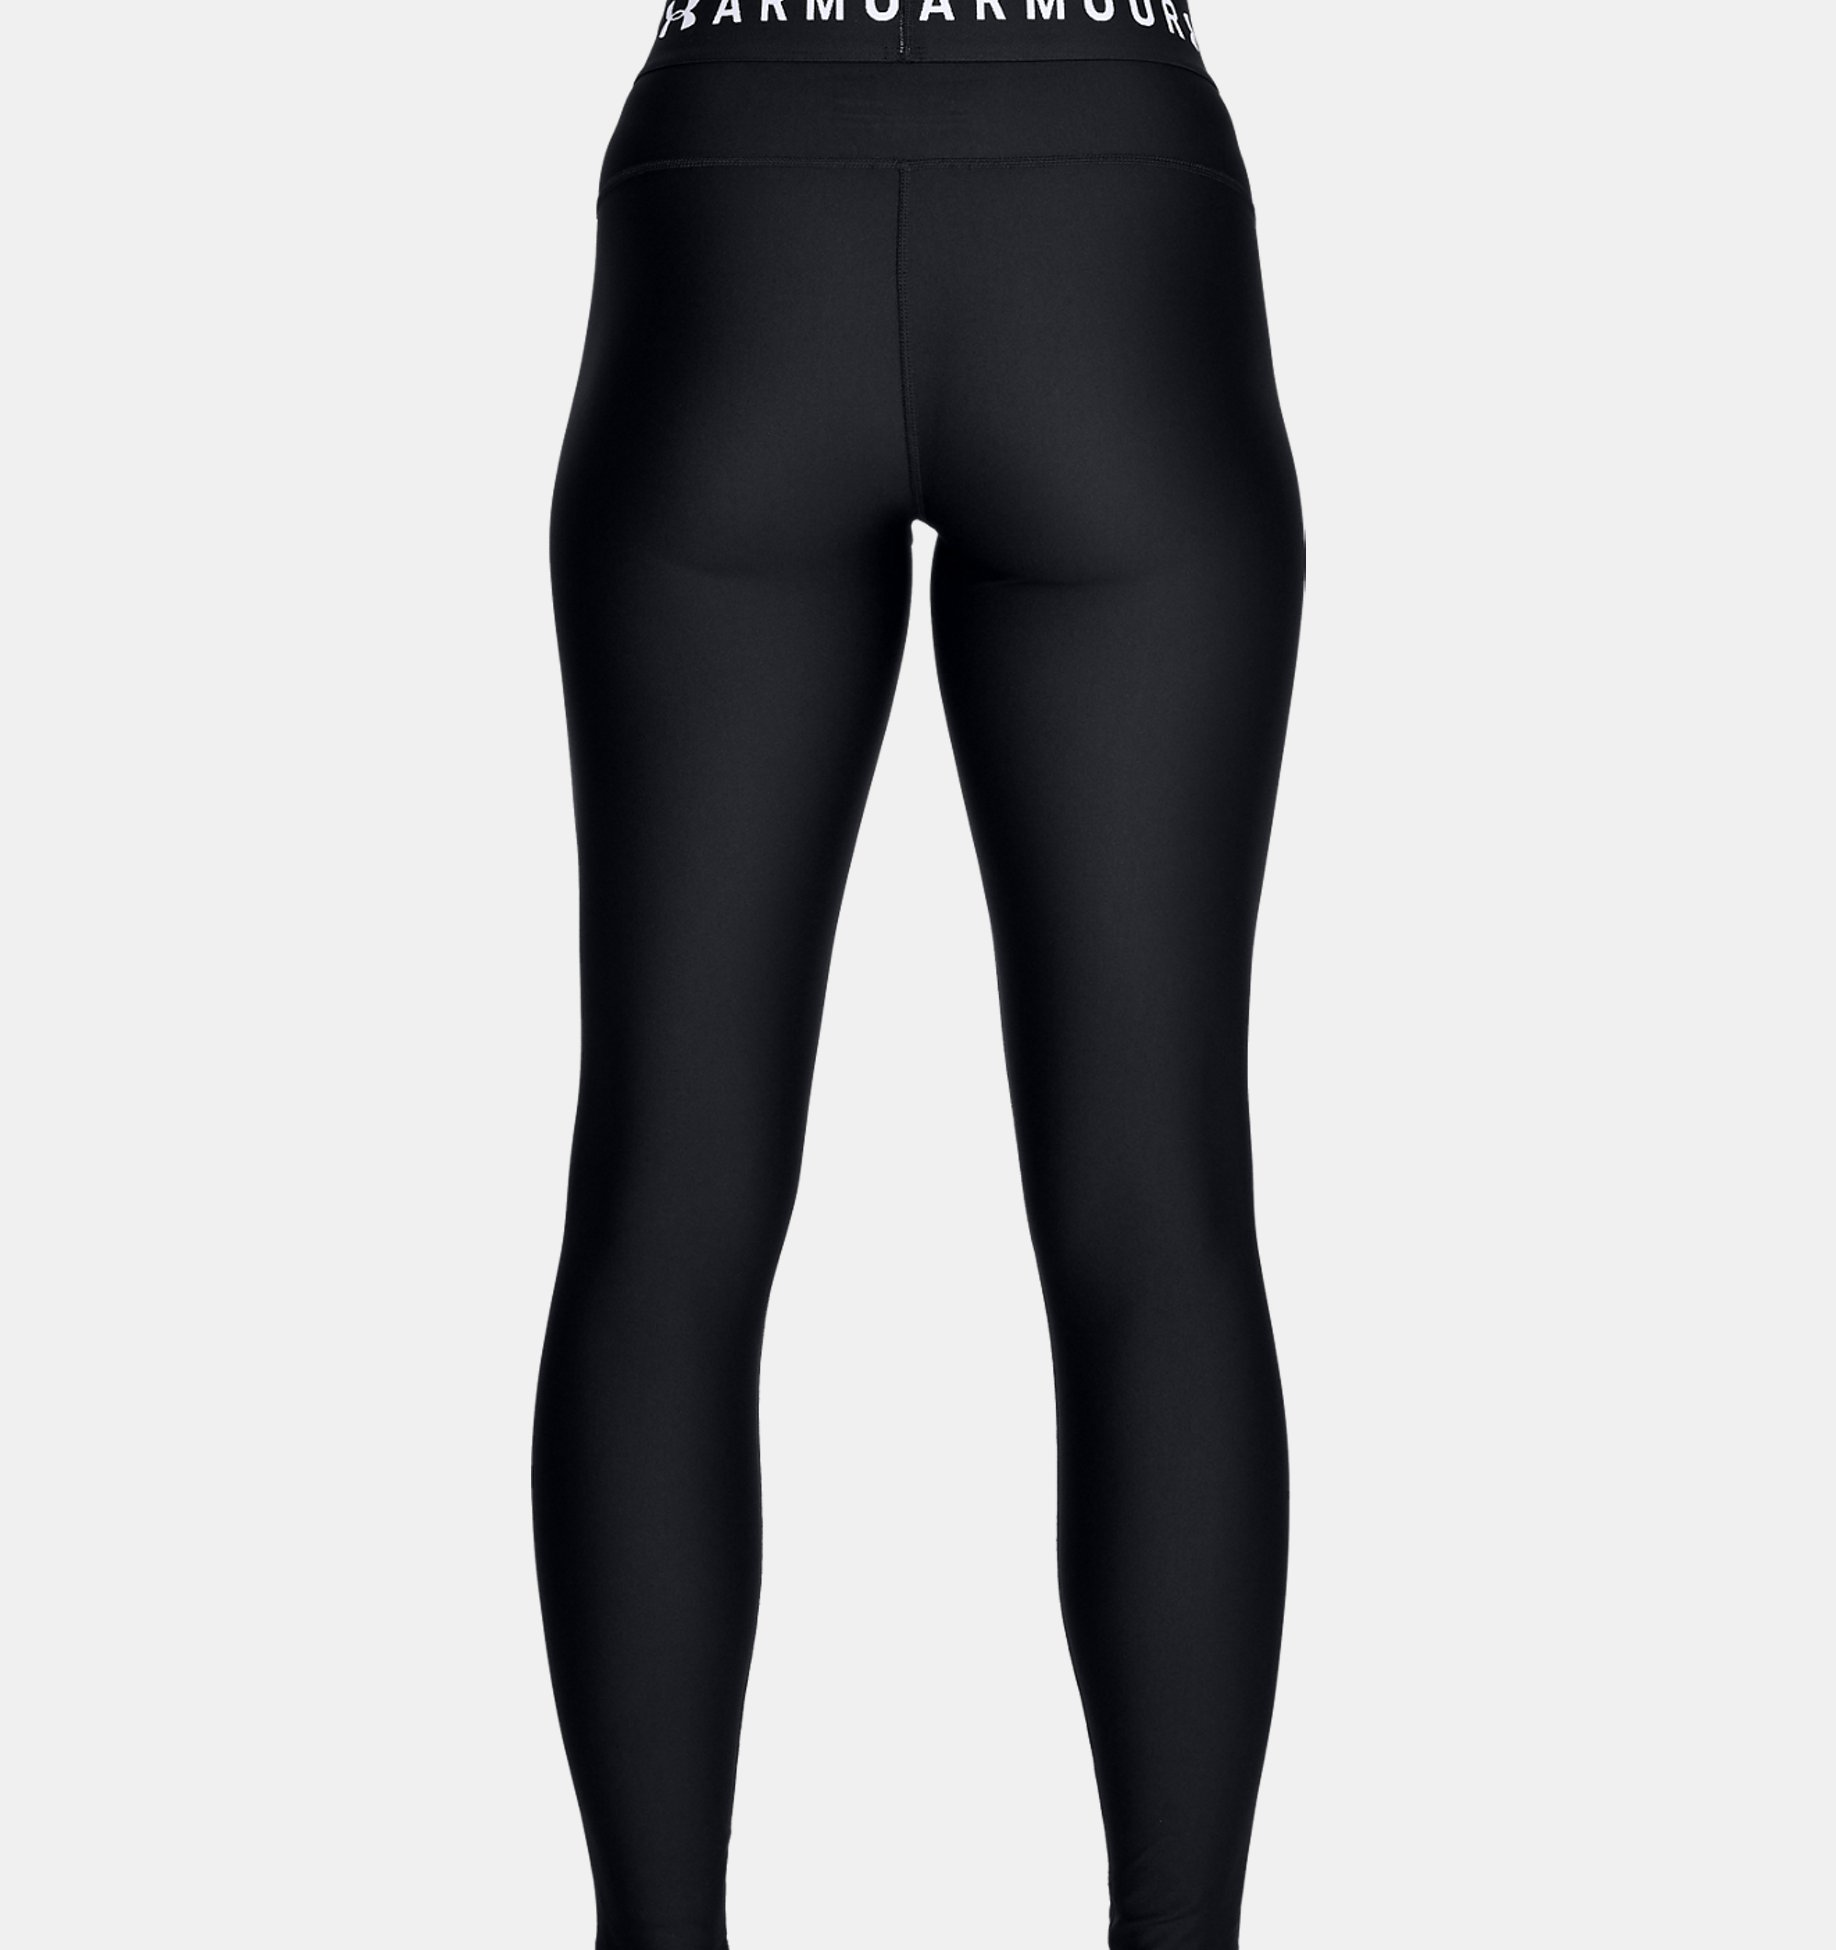 Women's HeatGear® Armour Branded WB Leggings | Under Armour